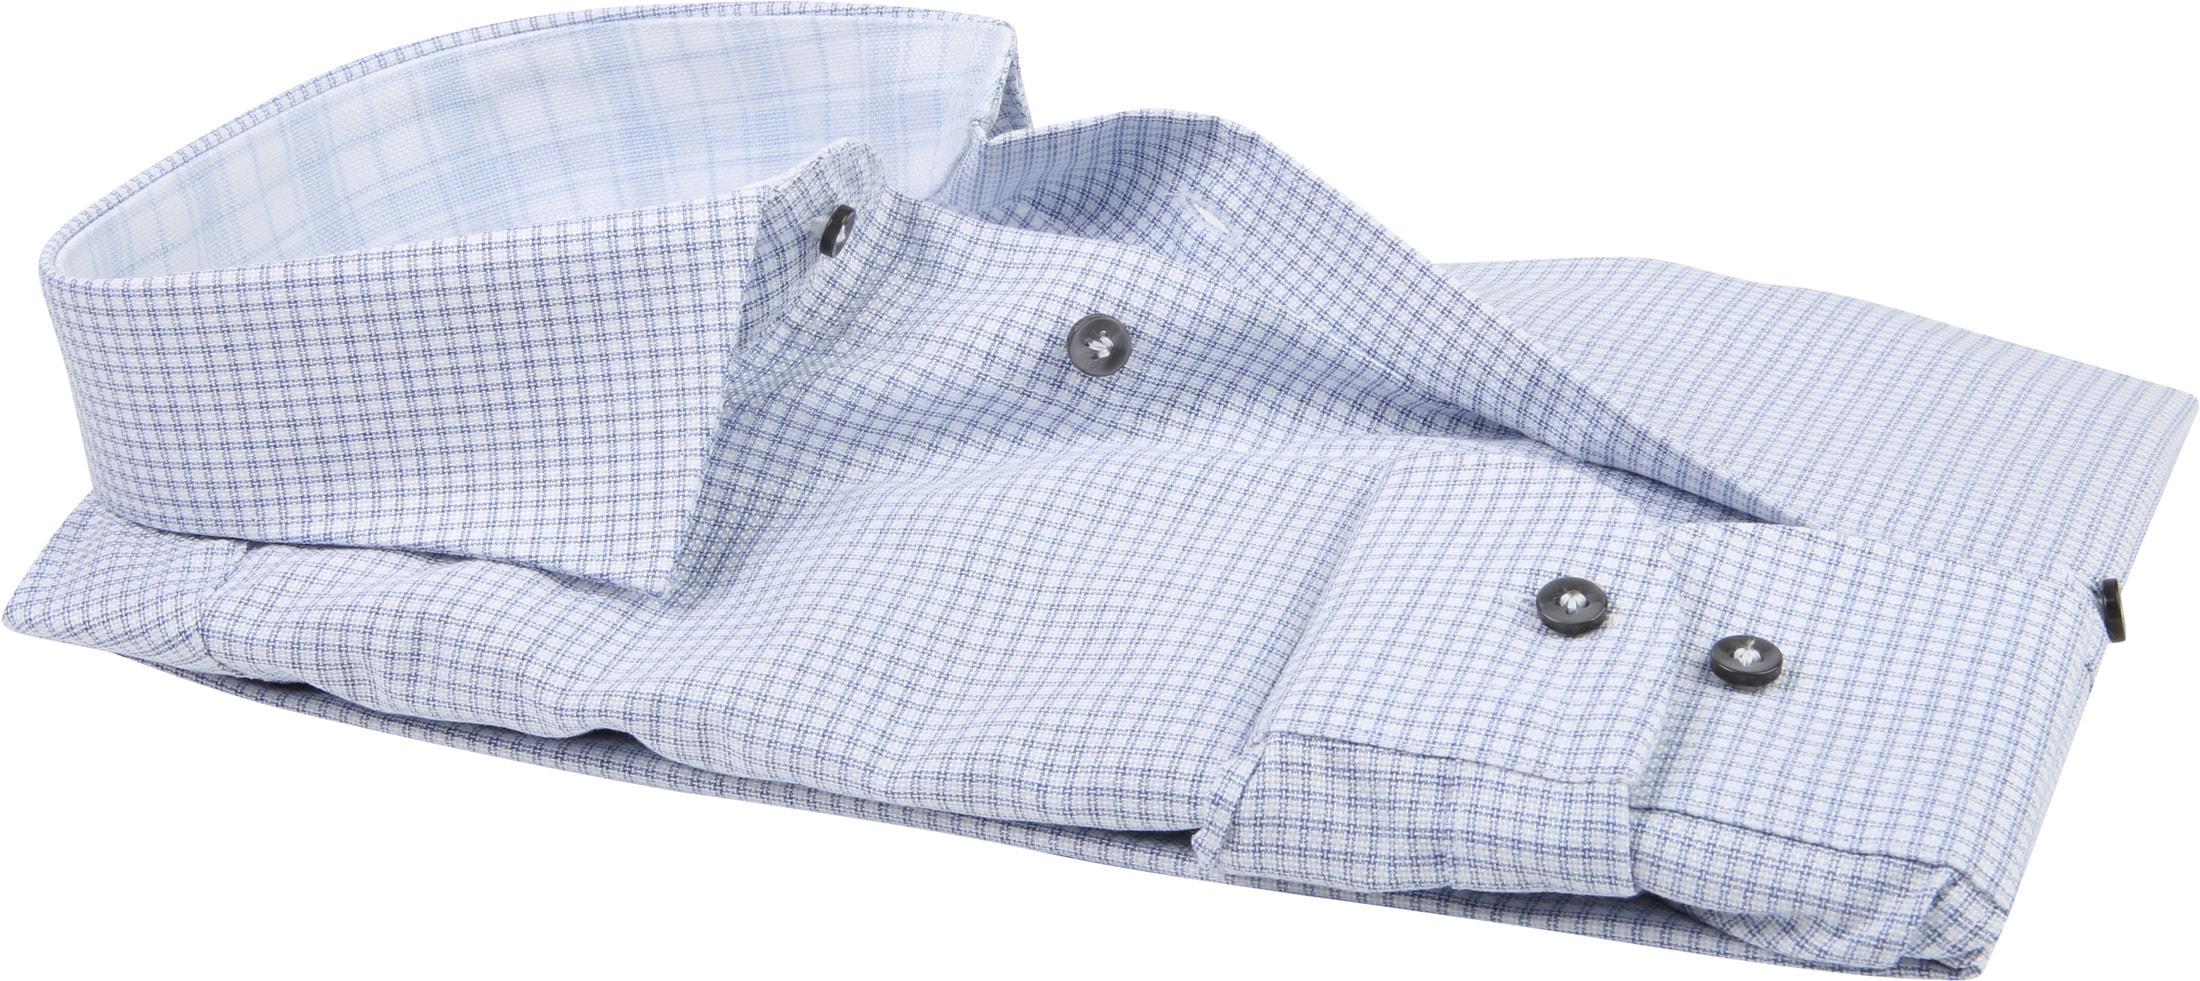 Profuomo Overhemd CAW Ruit Blauw foto 2